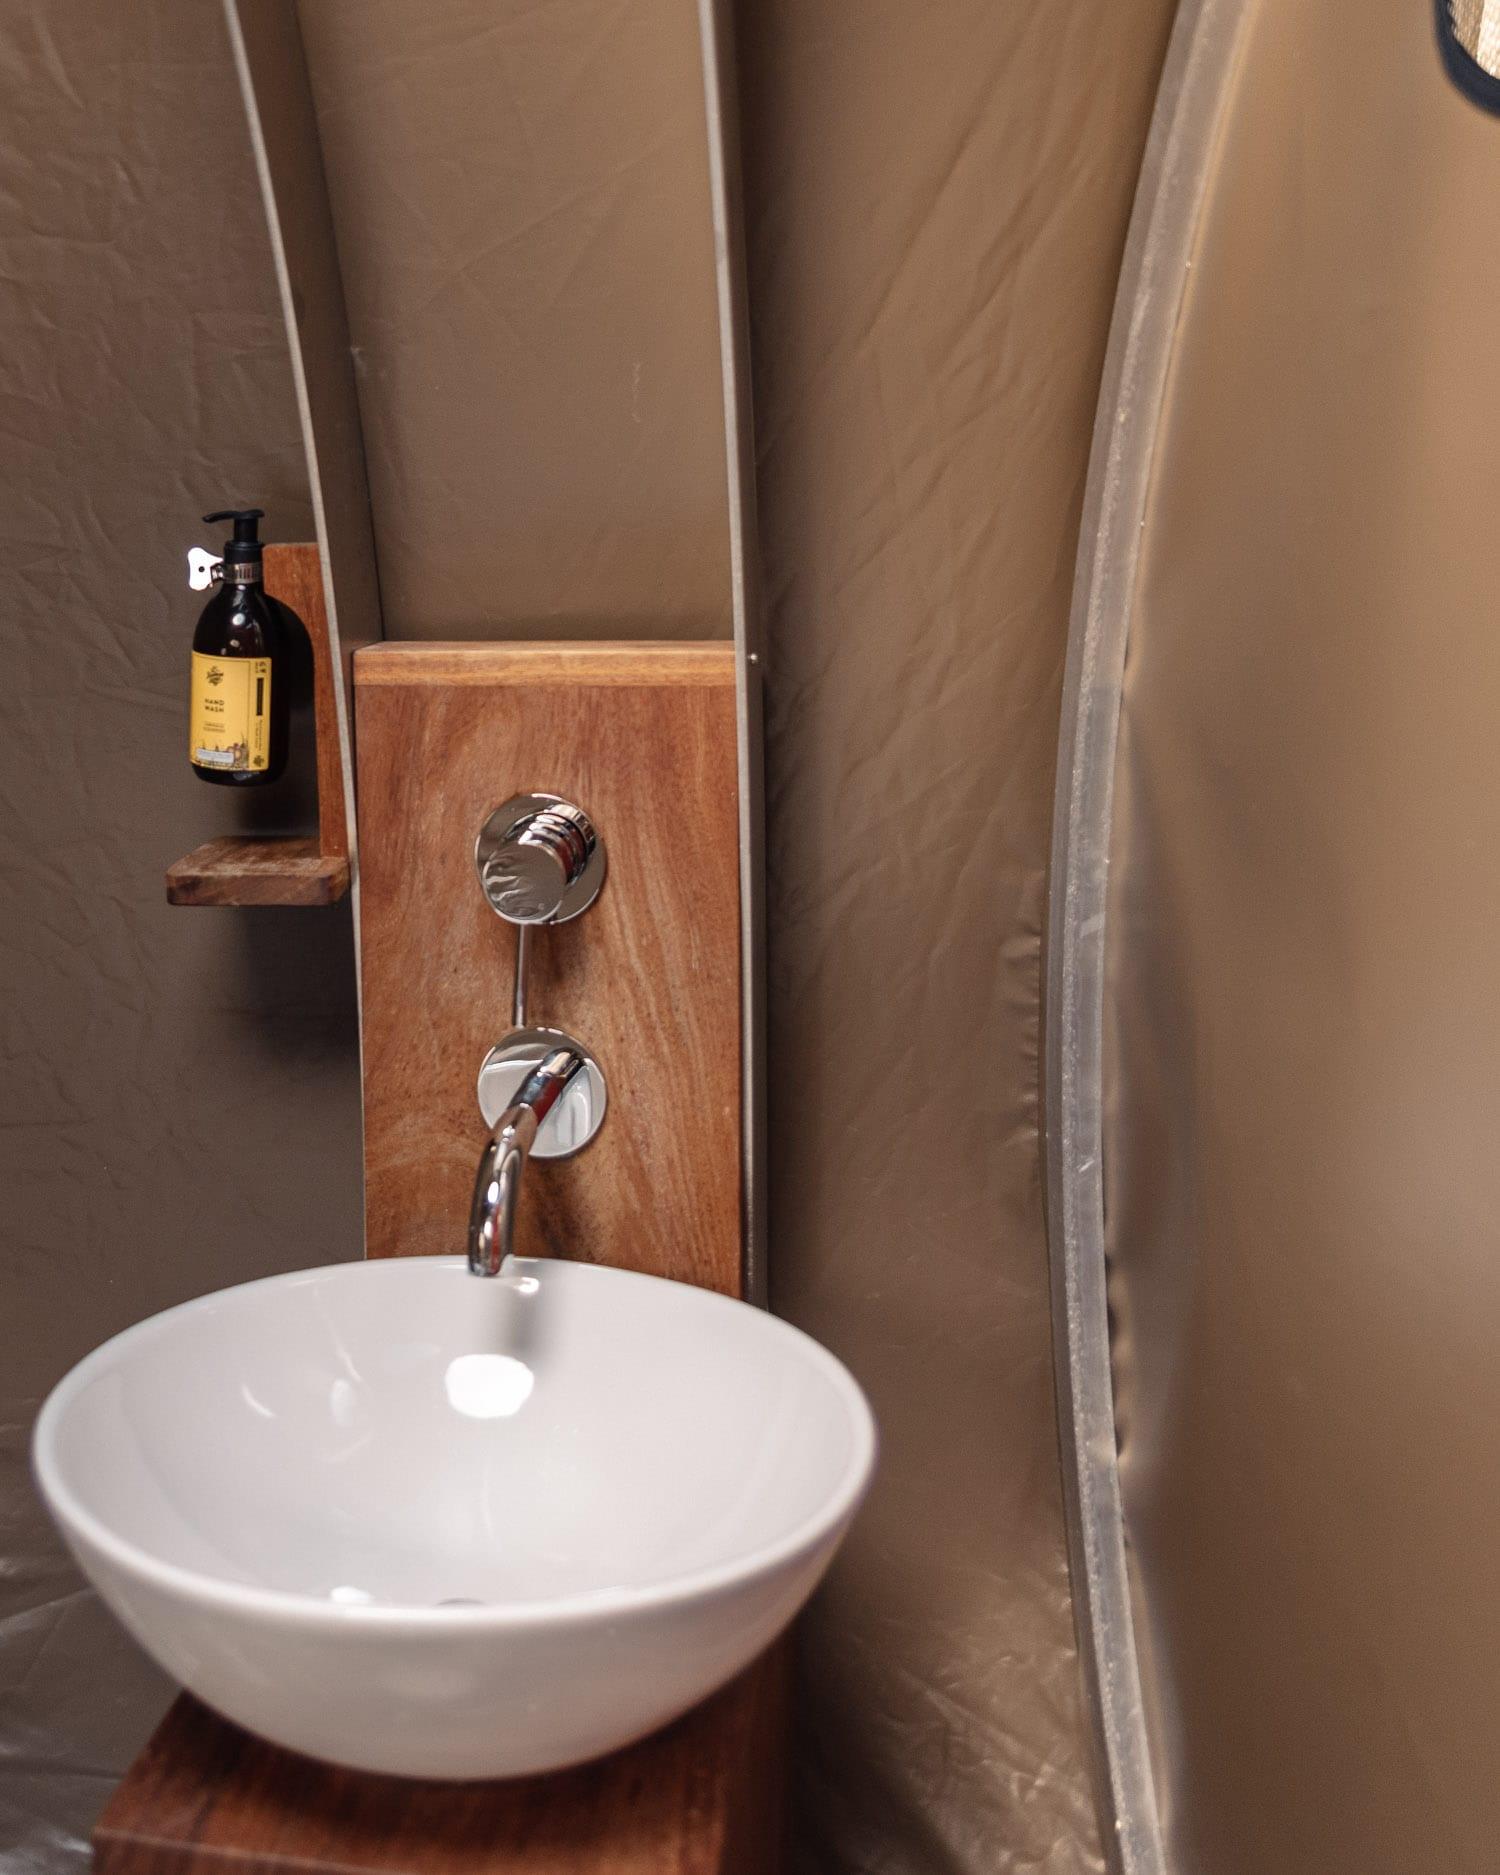 Bathroom - Finn Lough Bubble Domes Hotel in Northern Ireland